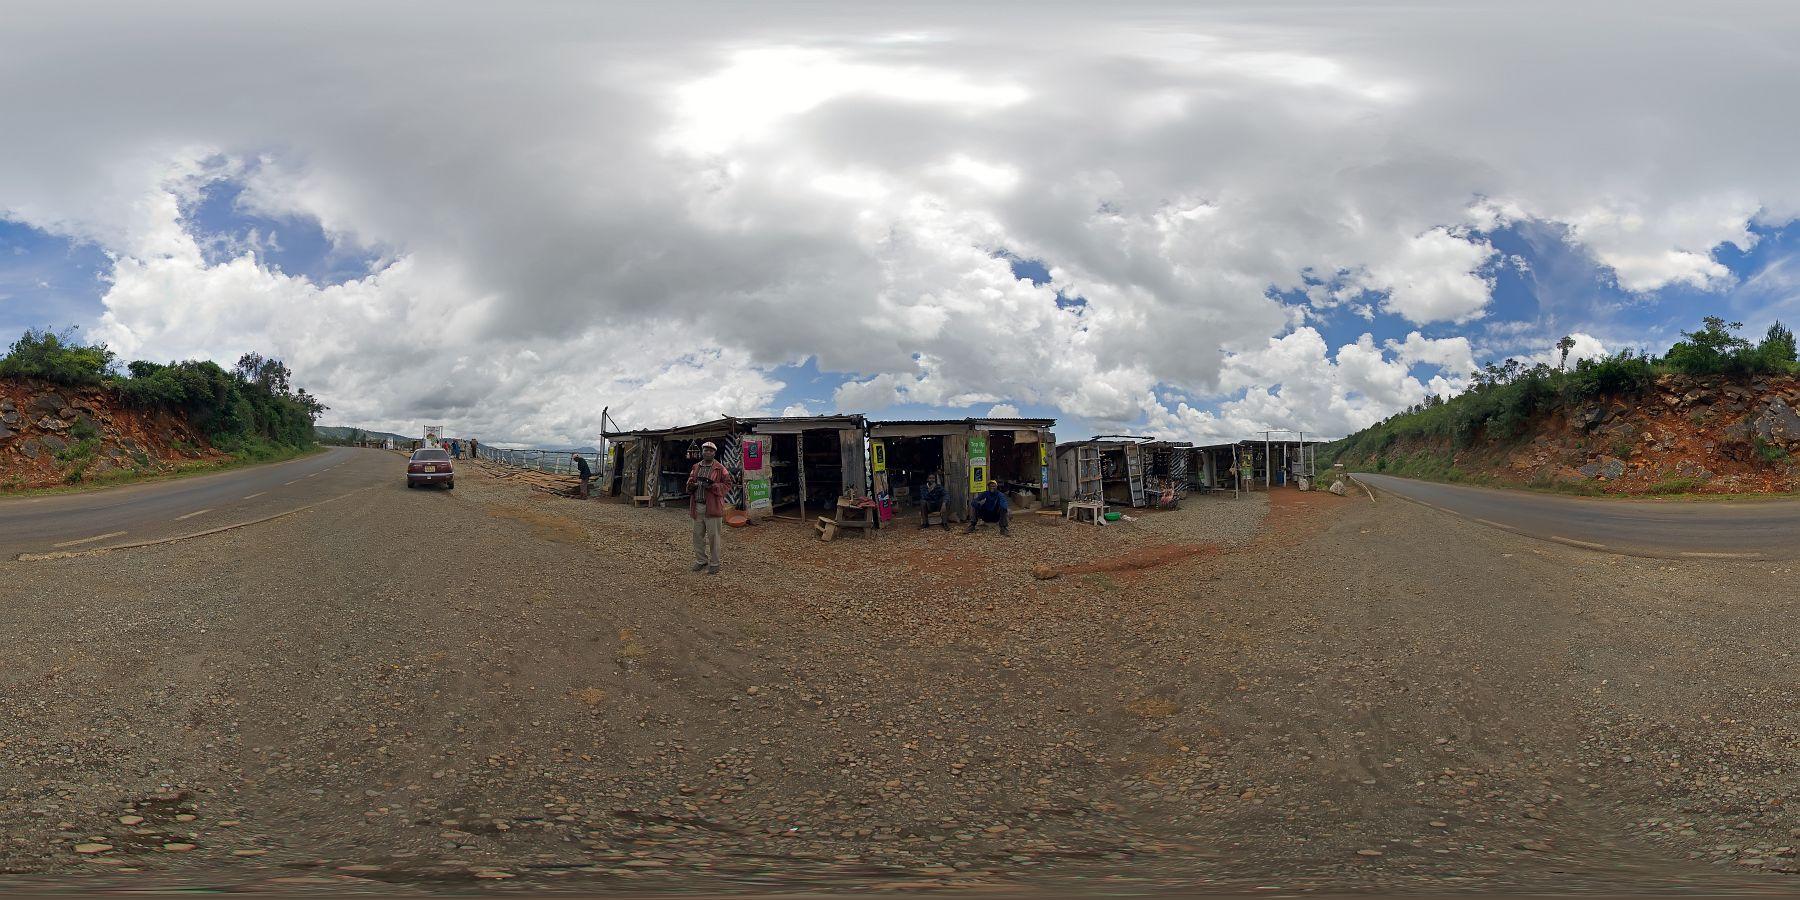 Panorama Kenia Nakuru Ausblick Ebene 1